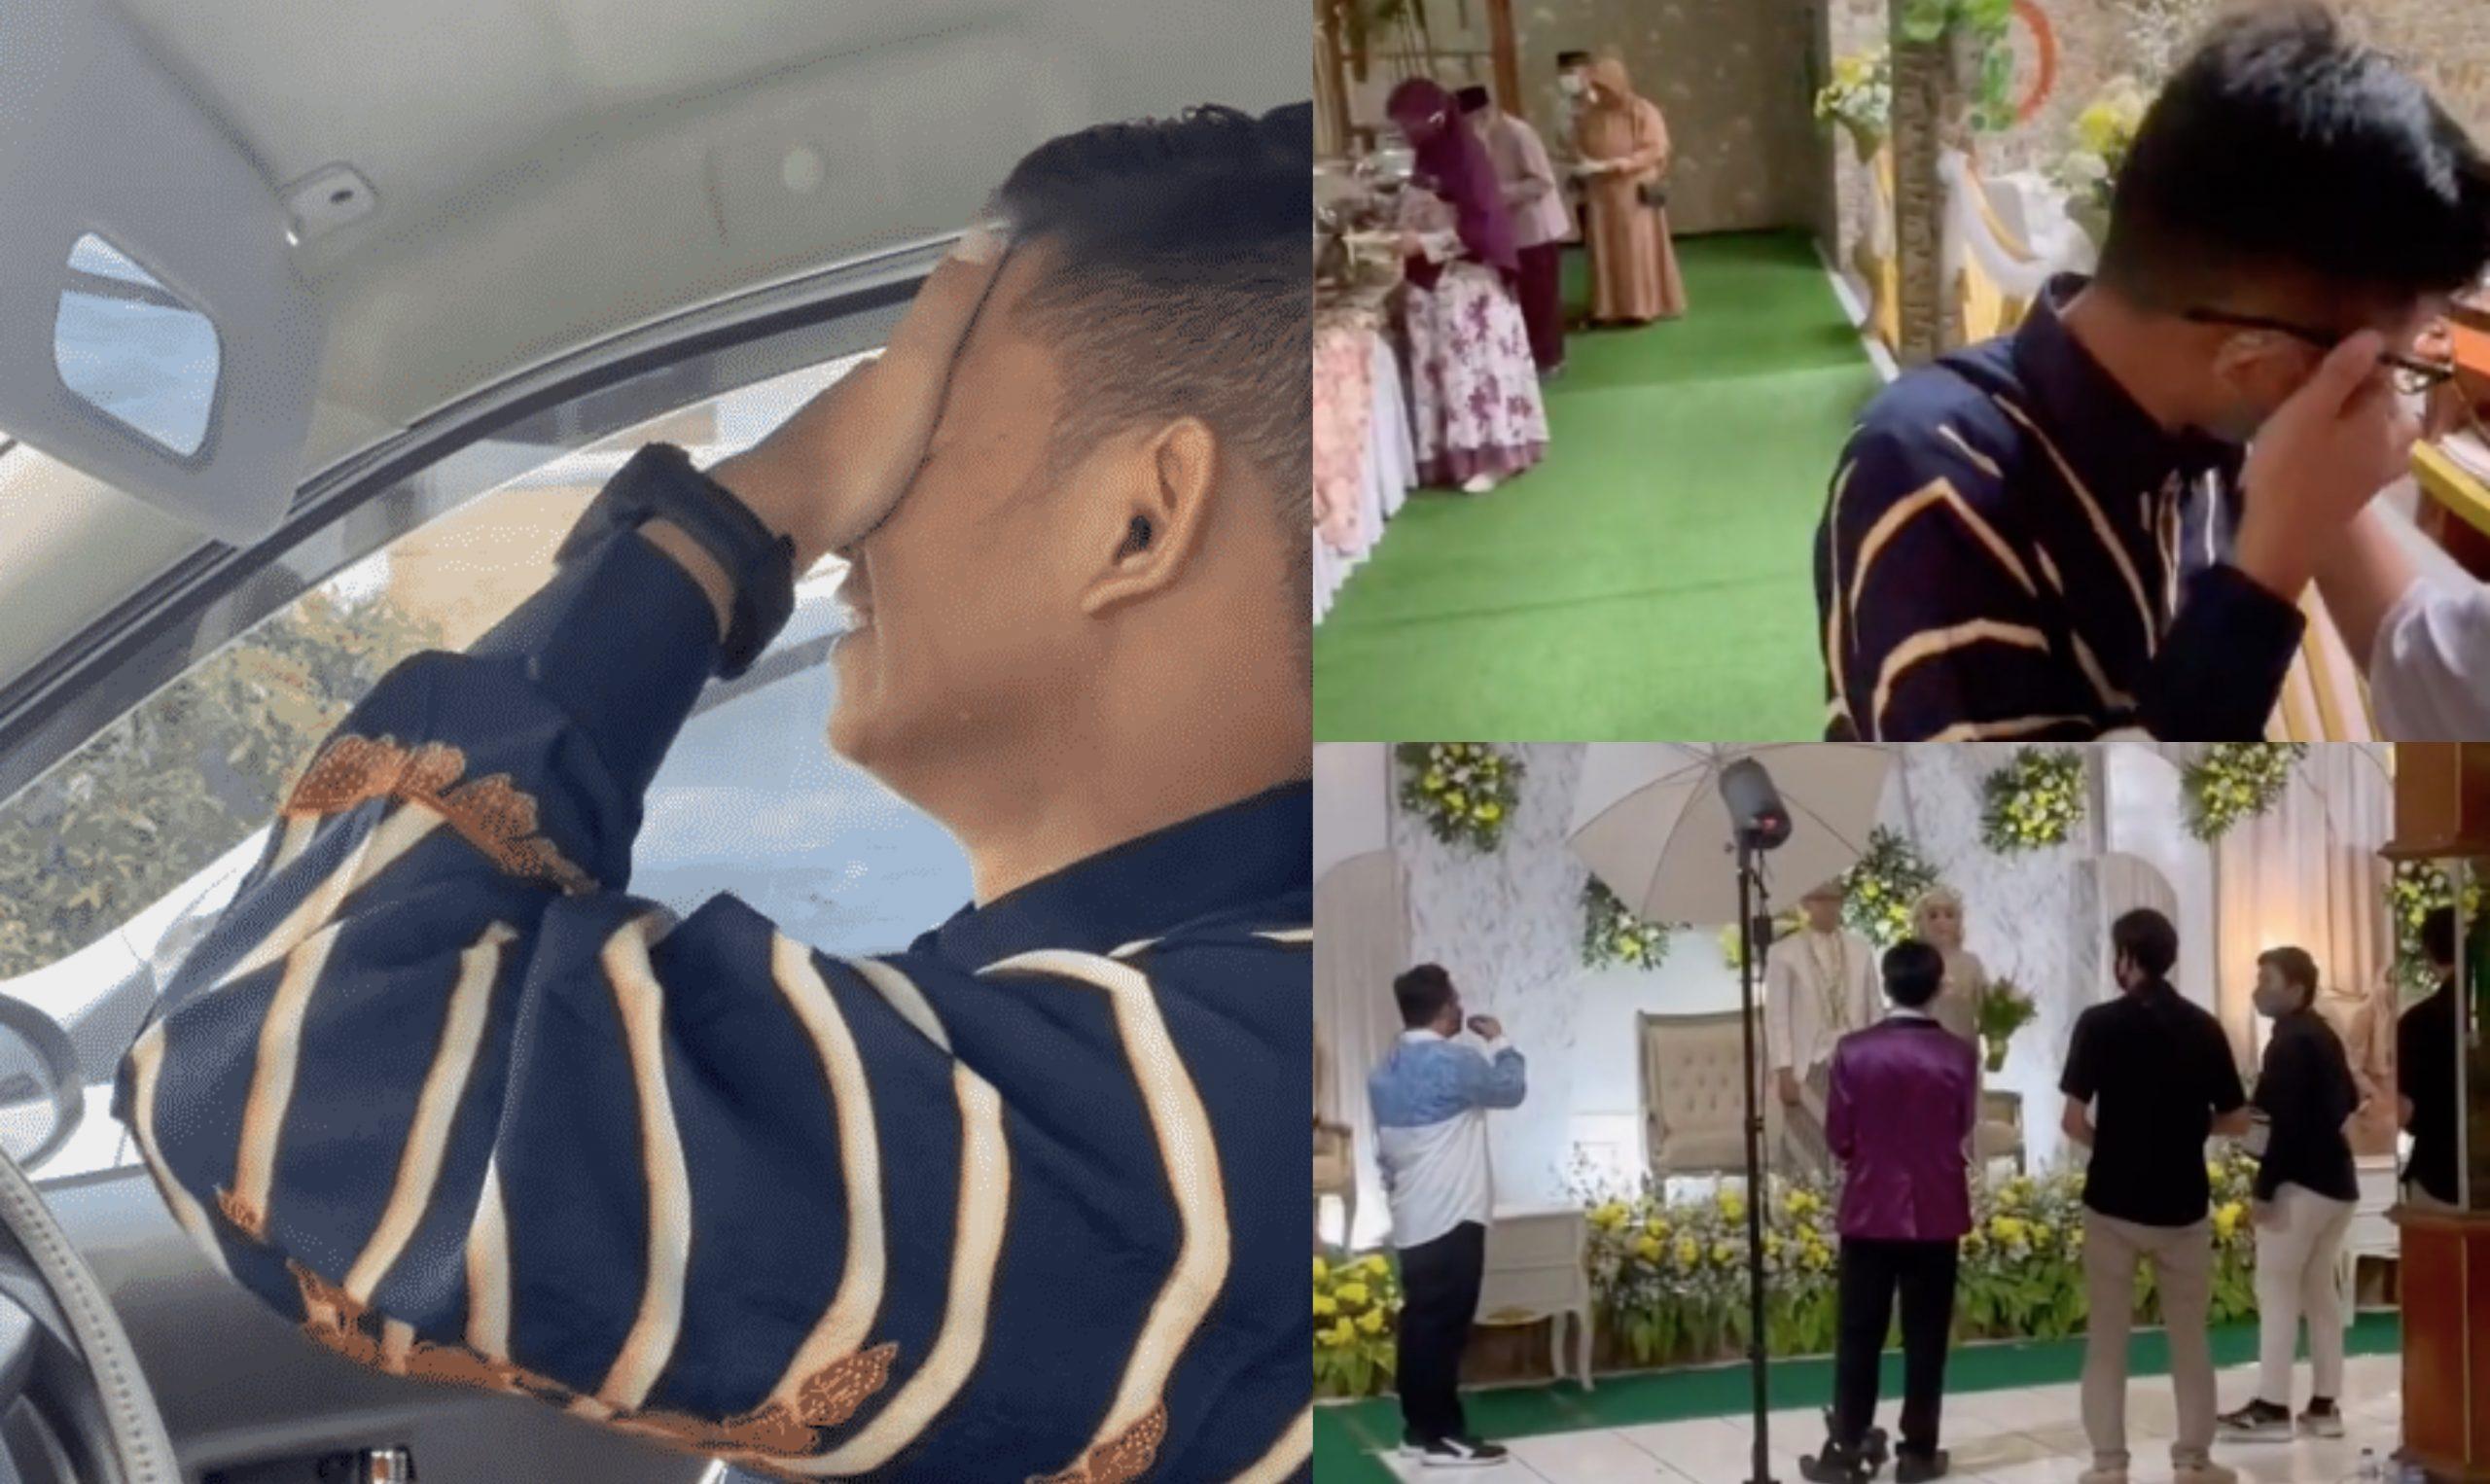 [VIDEO] 5 Tahun Jaga Jodoh Orang, Pemuda Nangis Datang Majlis Kahwin Bekas Kekasih – 'Dah Pesan Jangan Datang'